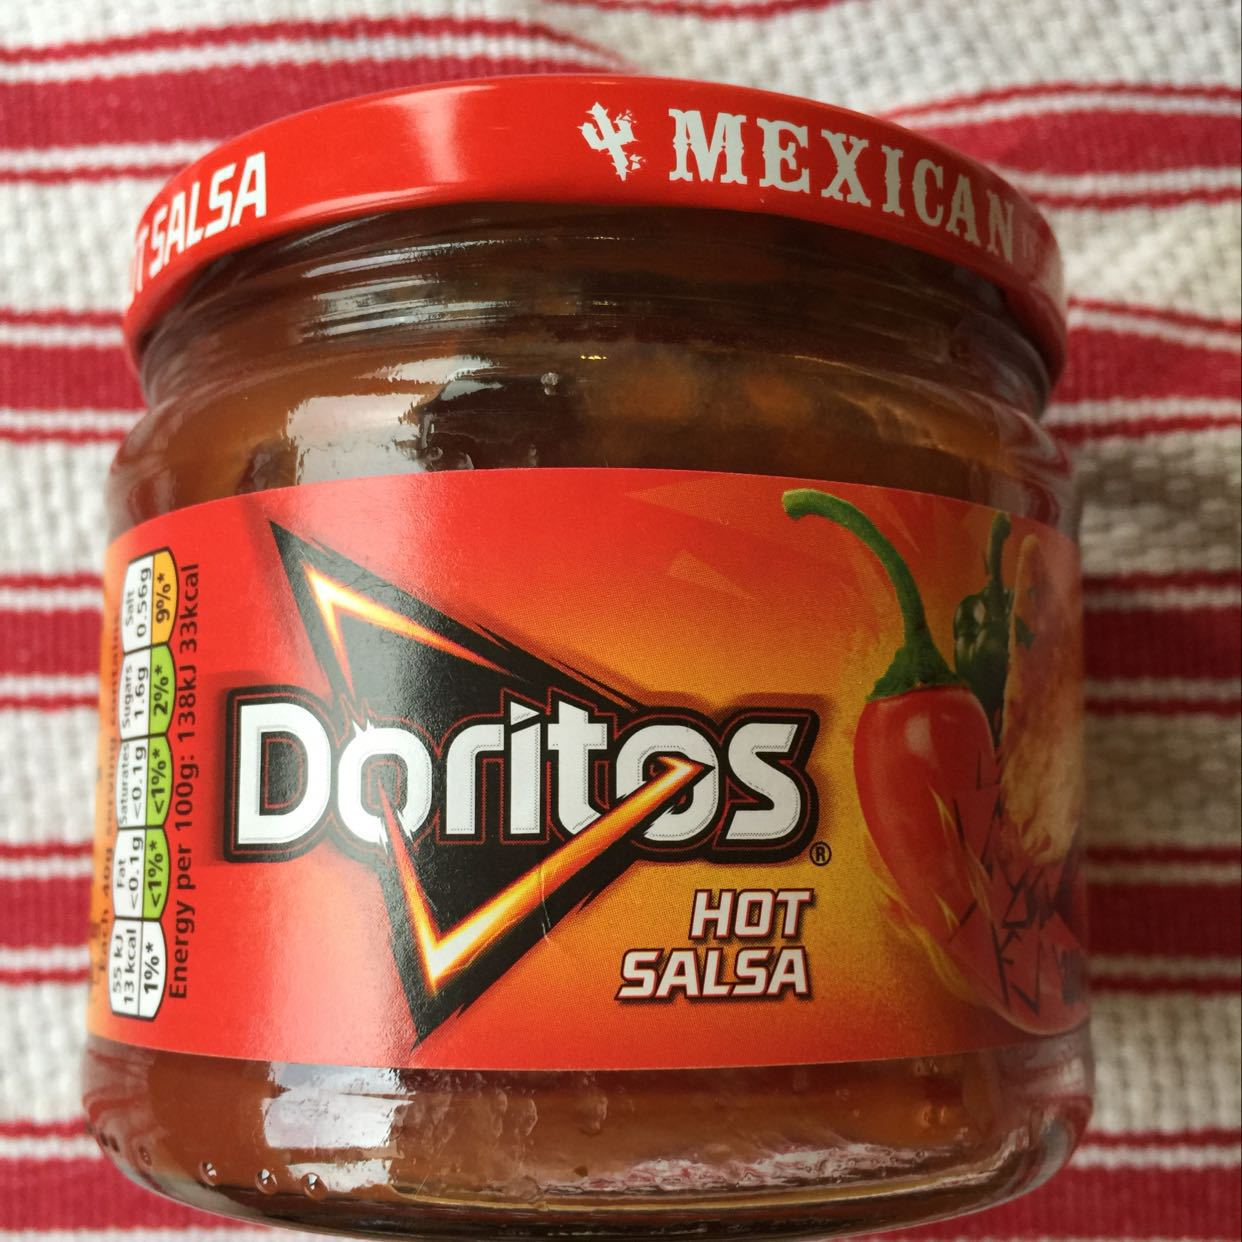 Doritos hot salsa Unopened